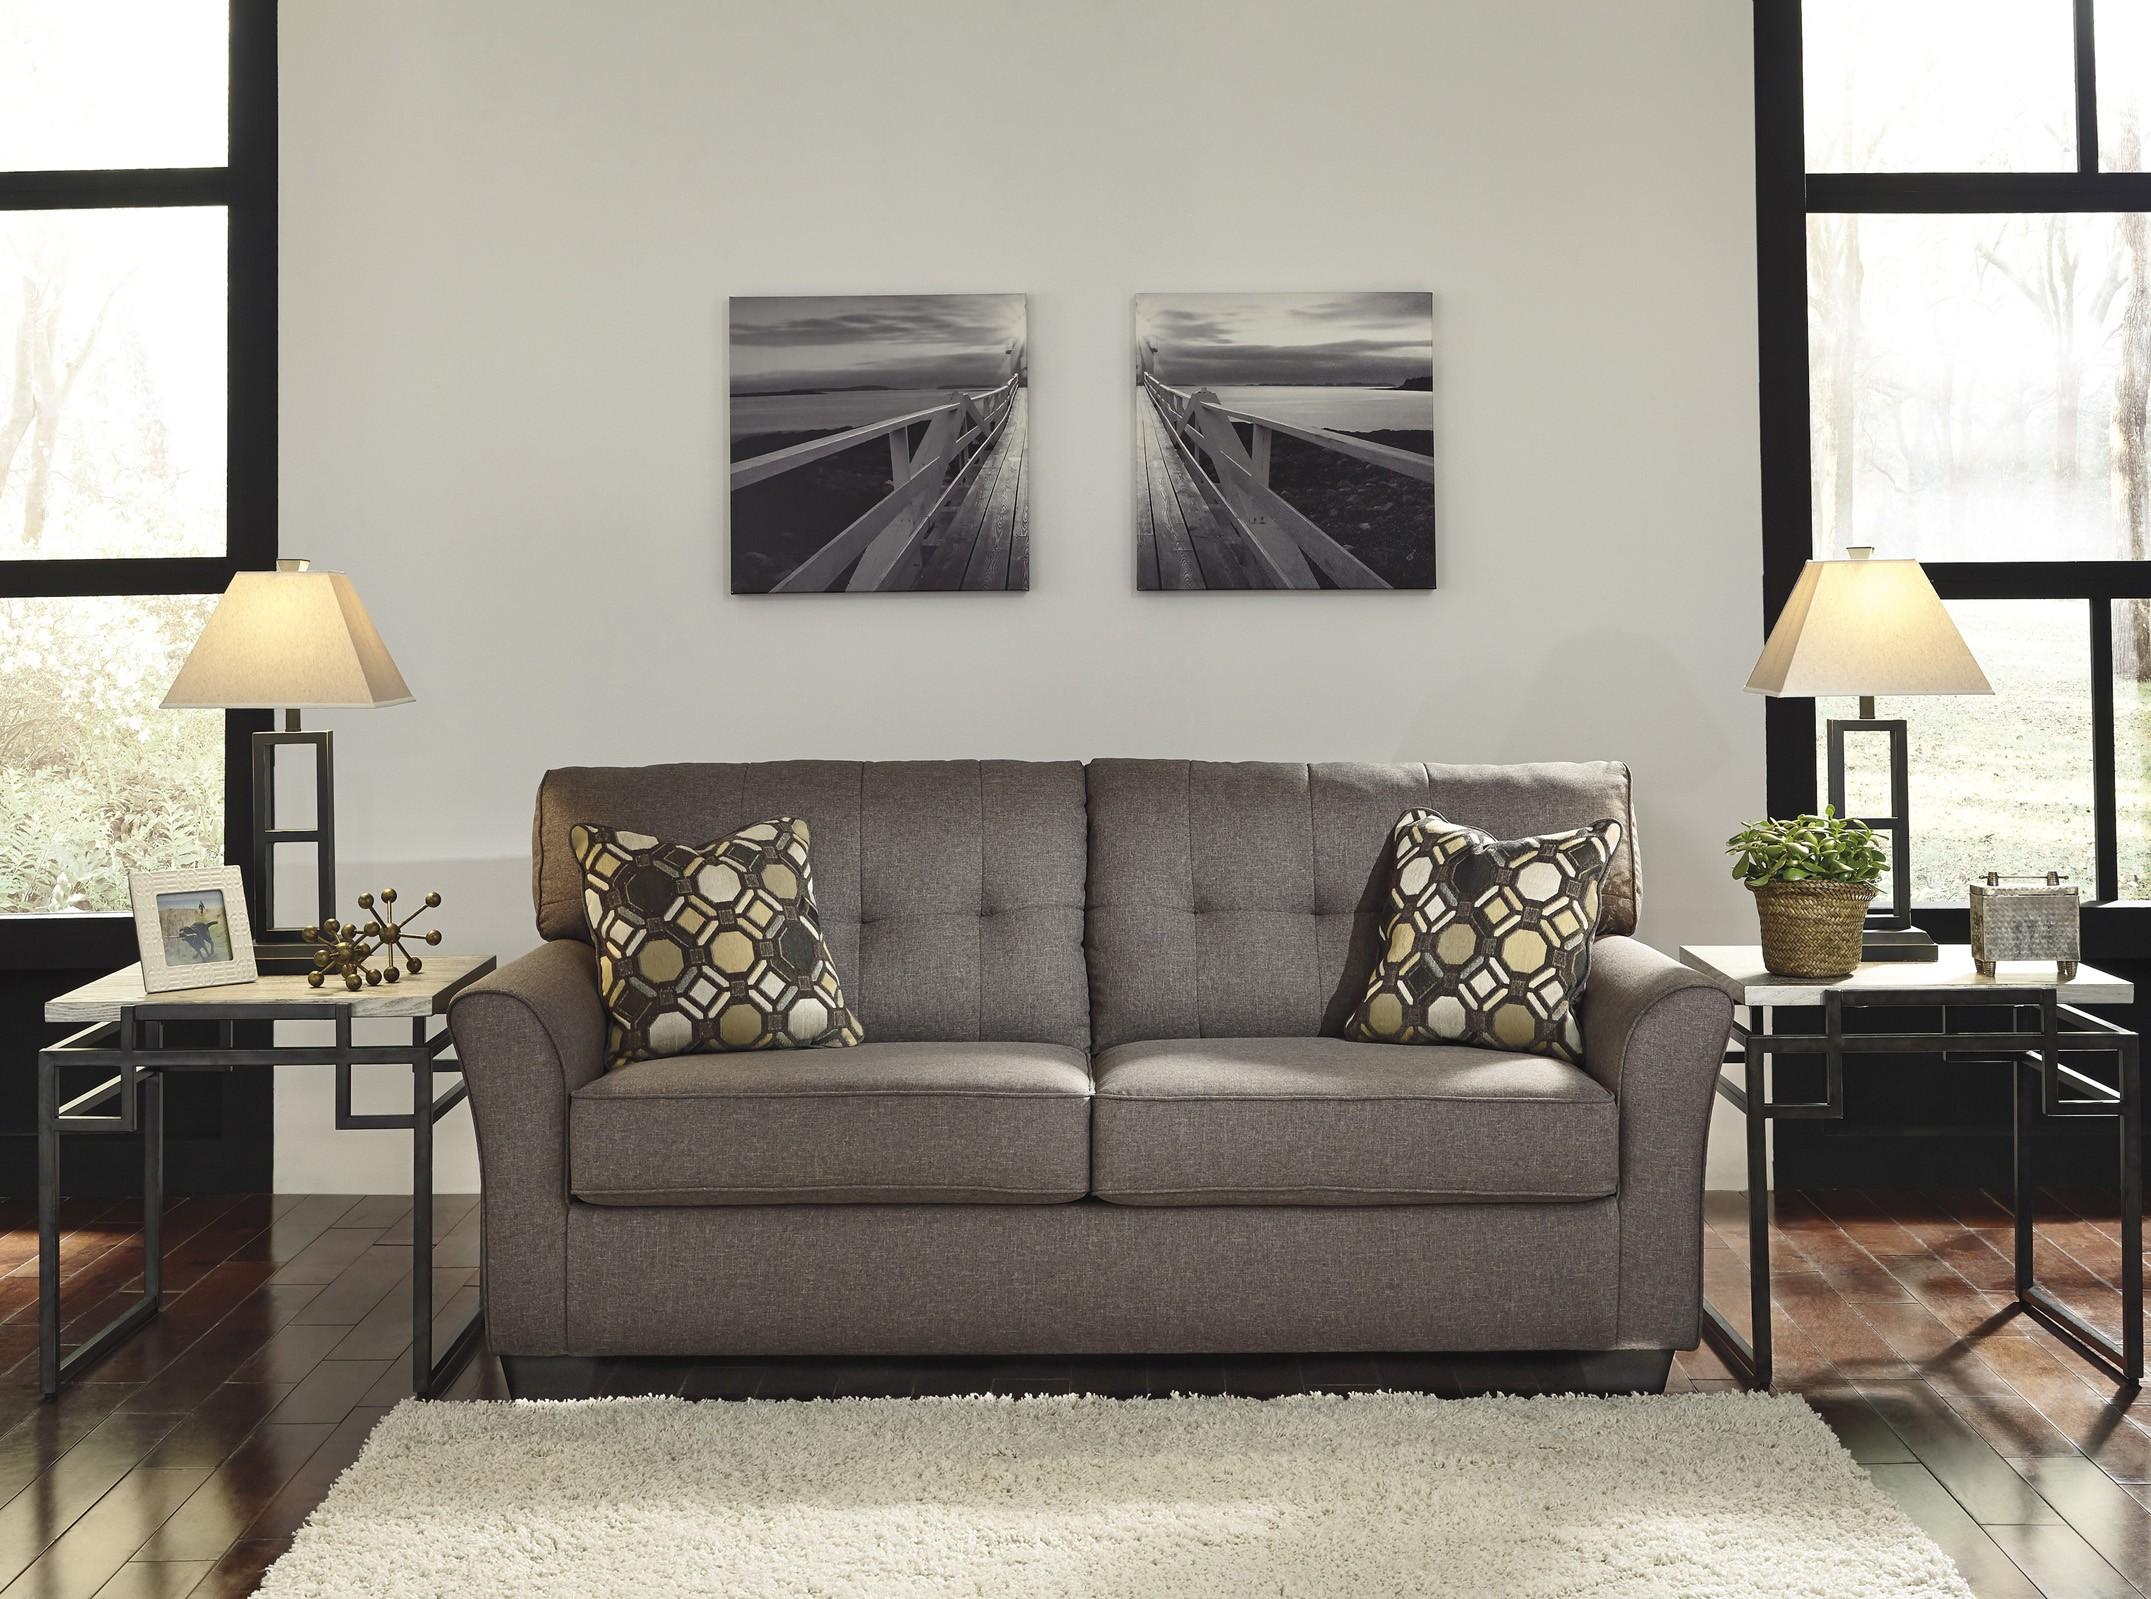 Ashley Furniture Tibbee Slate 2pc Living Room Set FREE